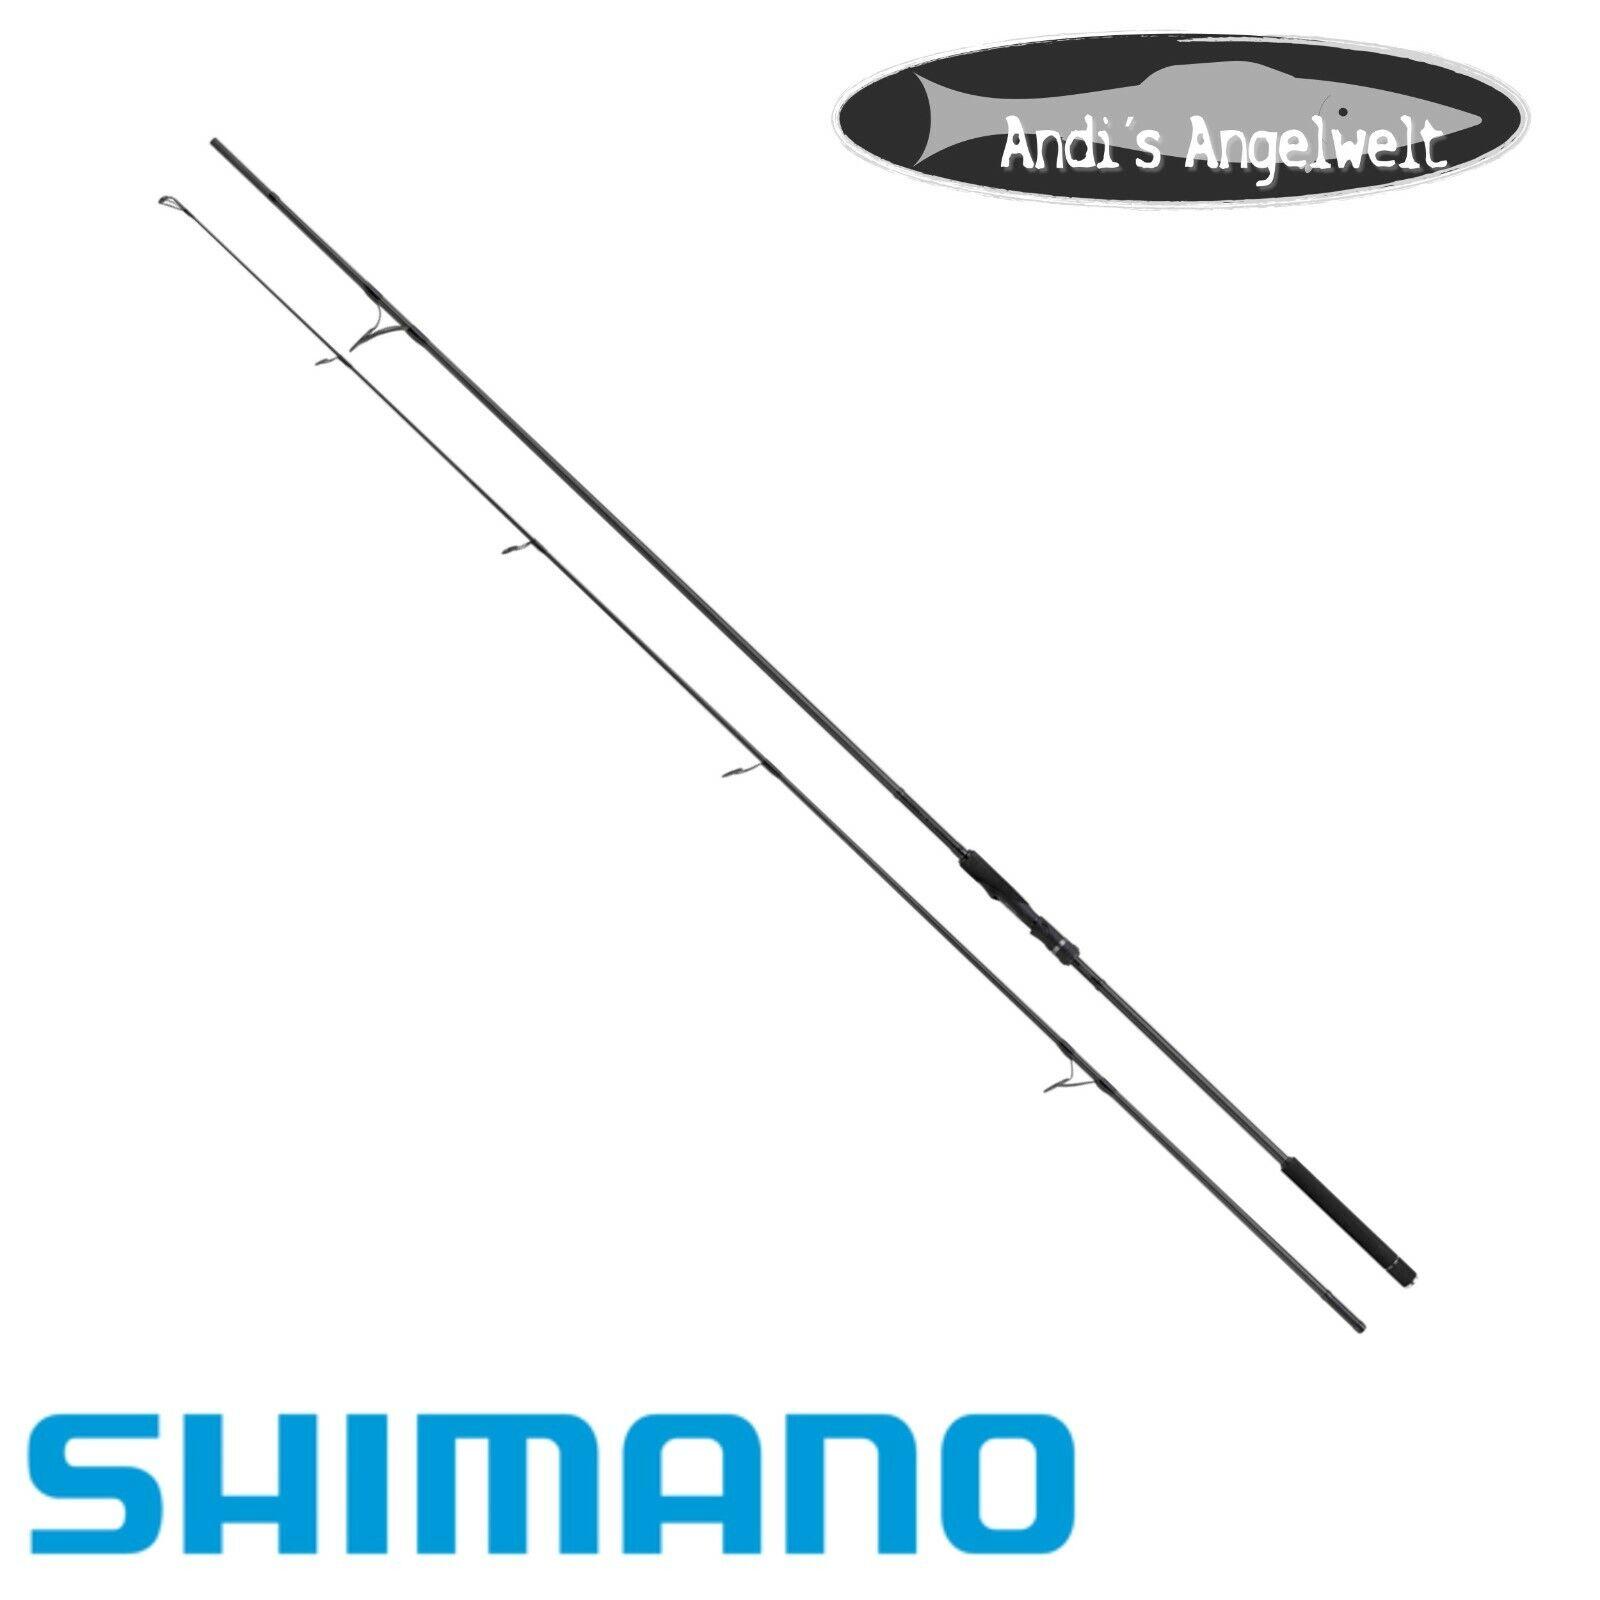 Shimano Tribal TX-9A 12 300 Karpfenrute 3,66m 3lb Weitwurfrute AKTIONSPREIS